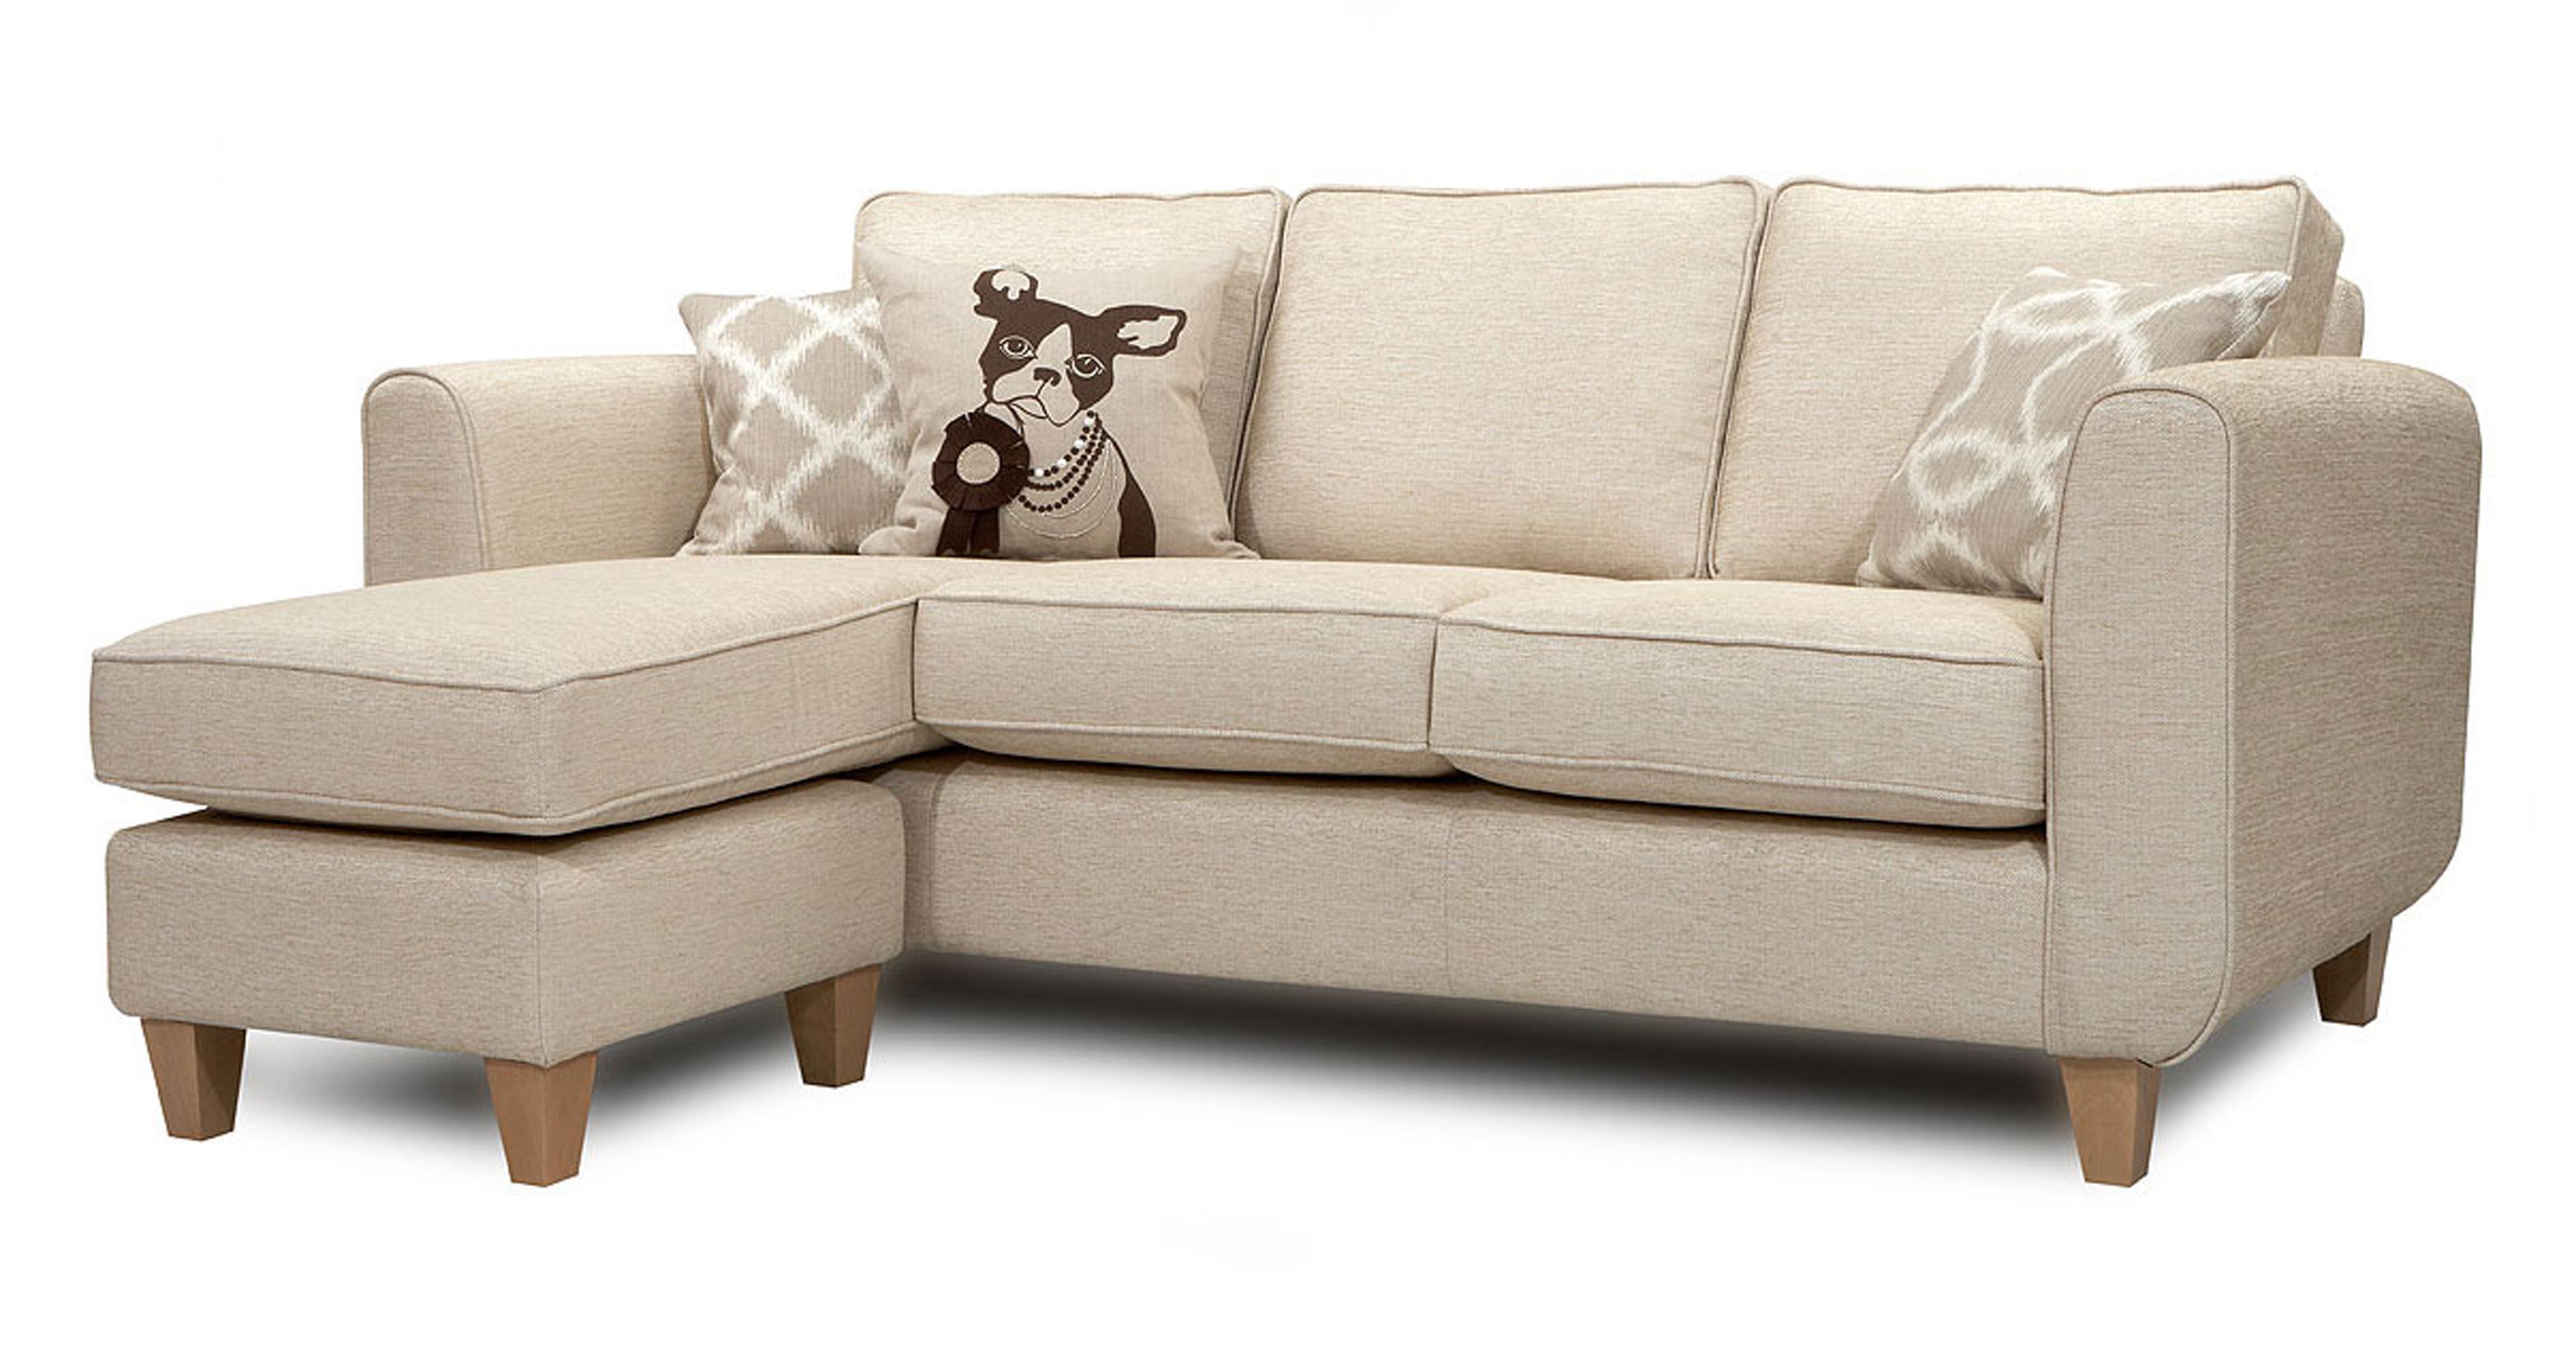 Dfs tote natural fabric set inc chaise sofa arm chair for Chaise watford